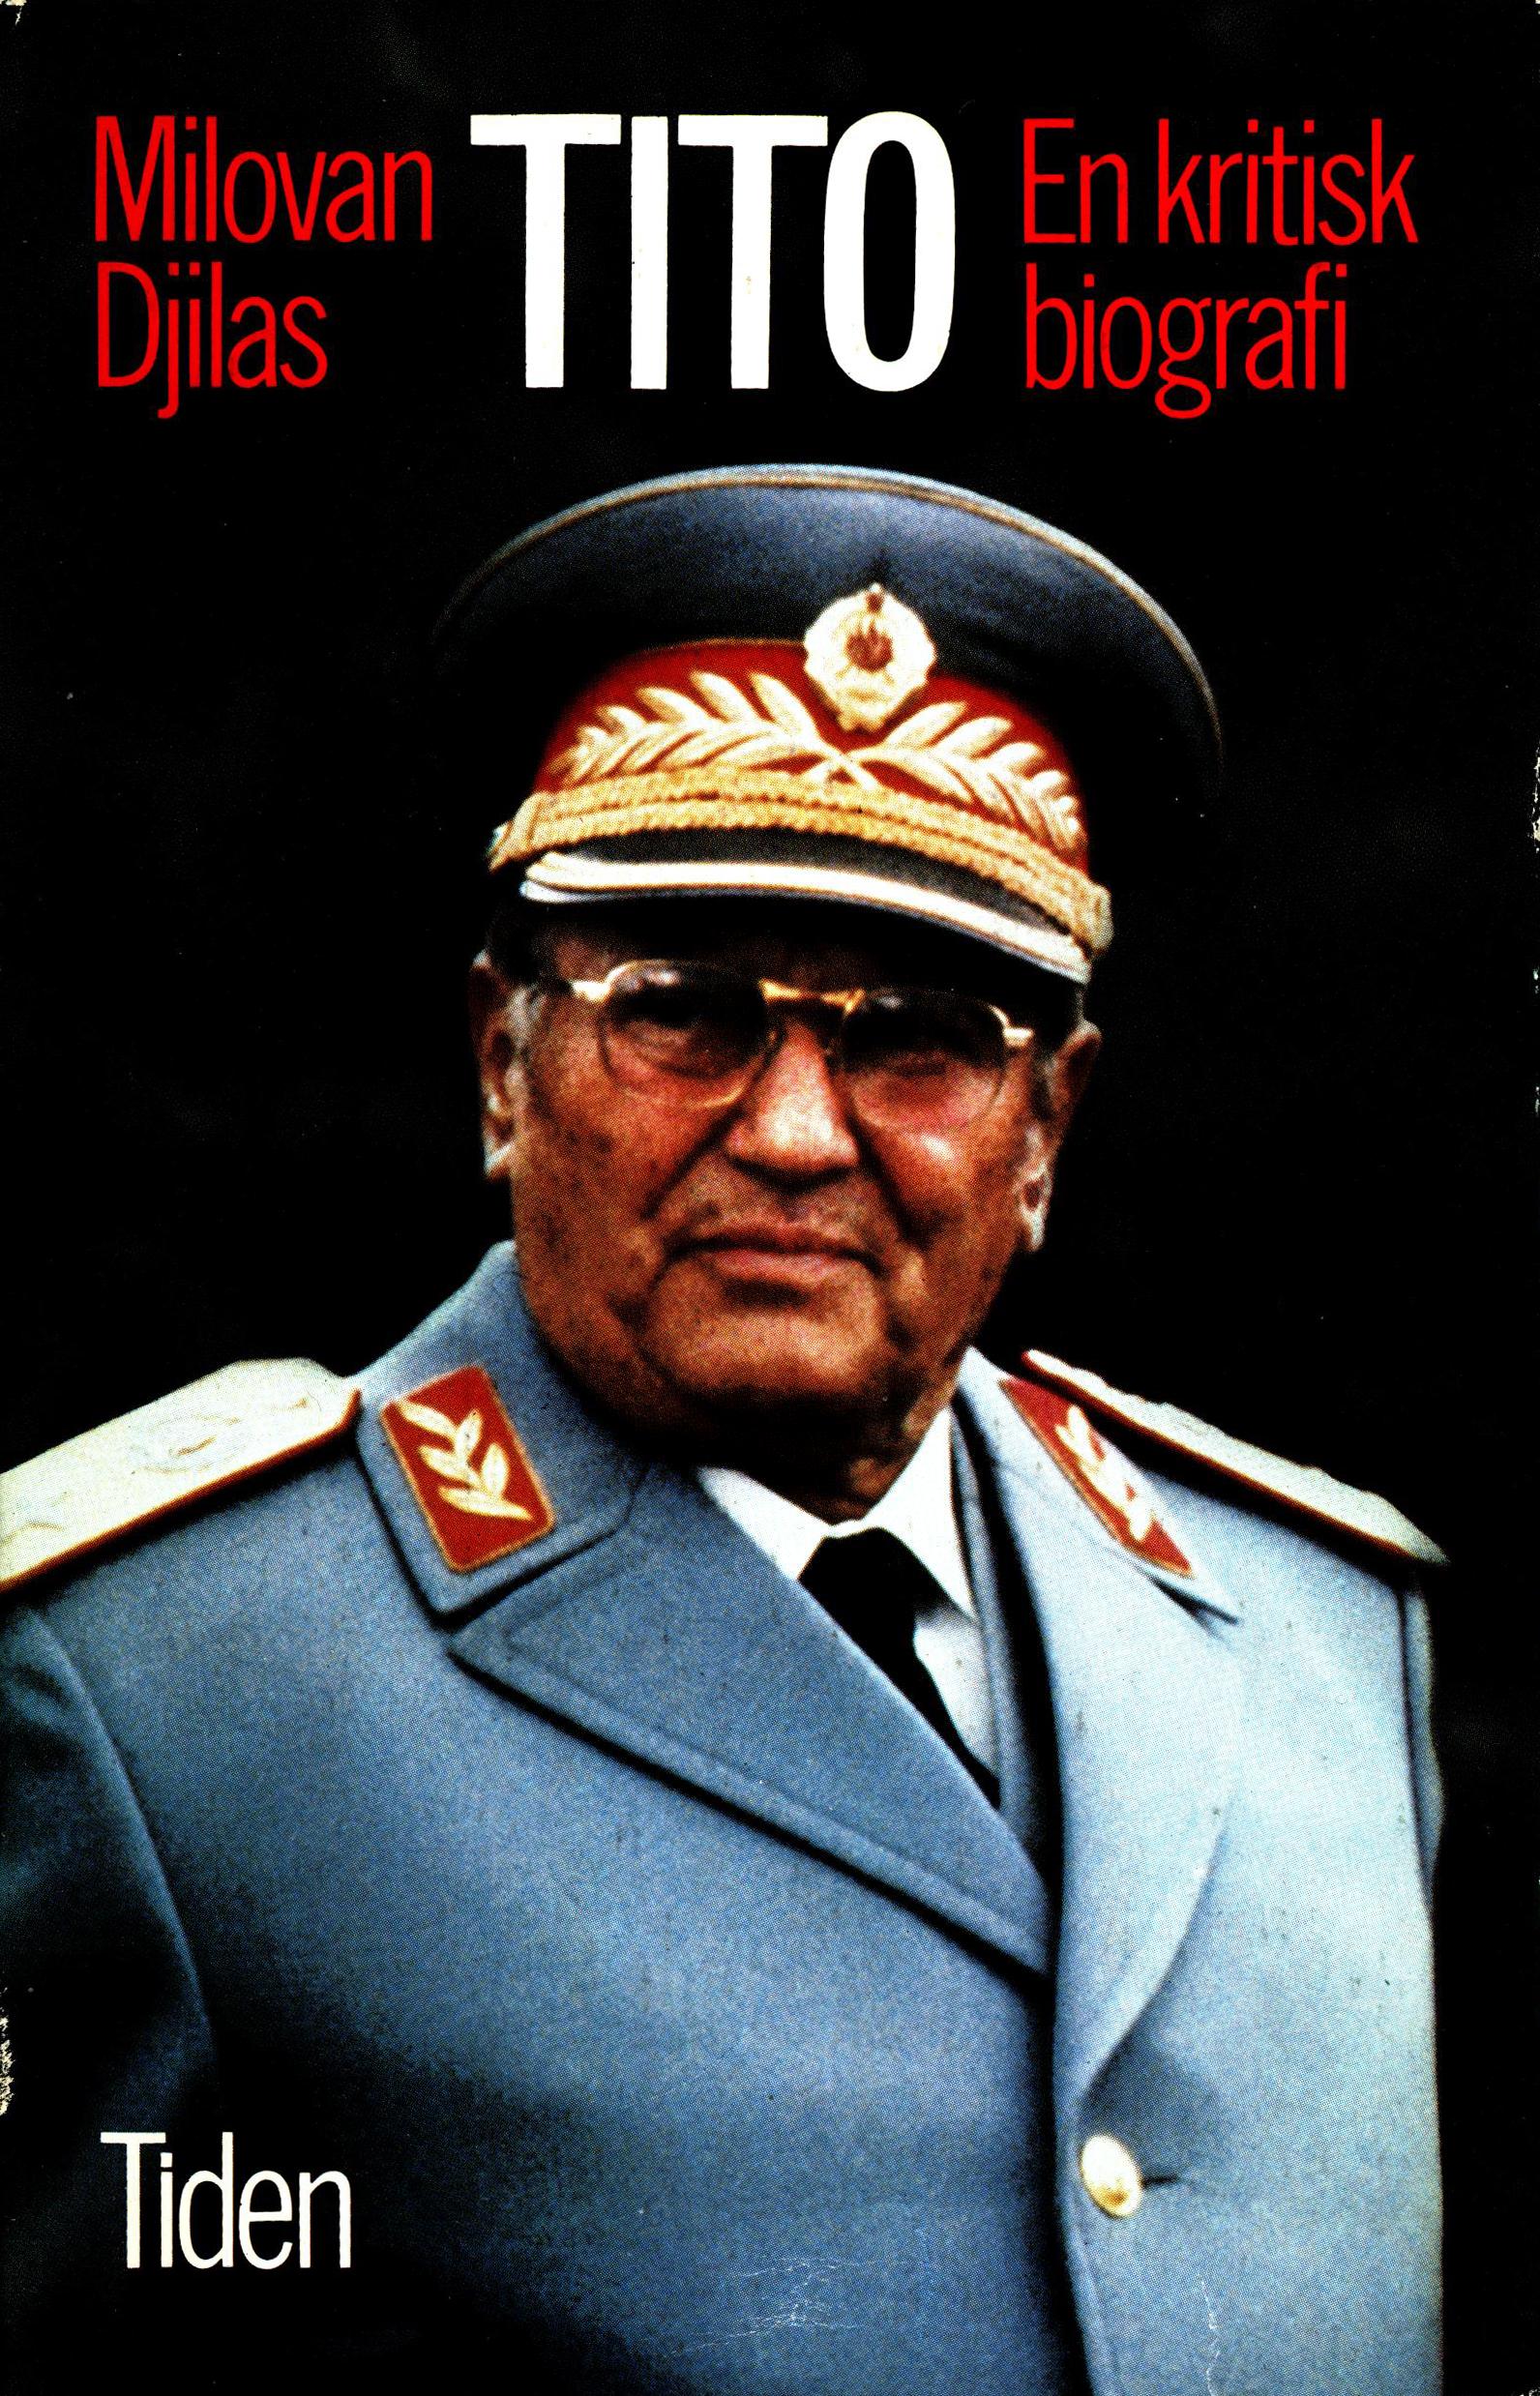 Milovan Djilas: Tito - En kritisk biografi